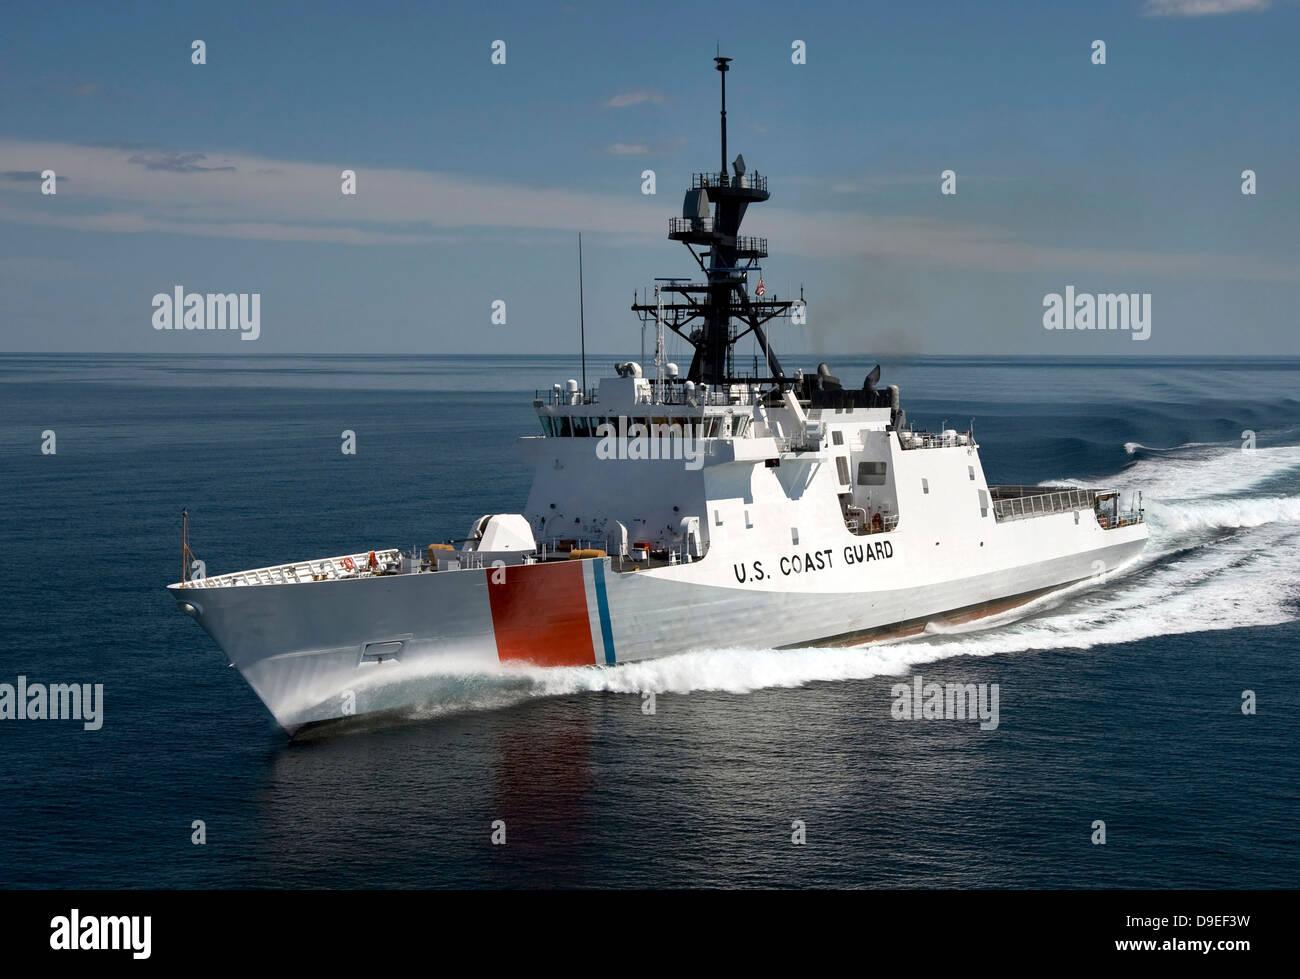 U.S. Coast Guard Cutter Waesche in the navigates the Gulf of Mexico. - Stock Image